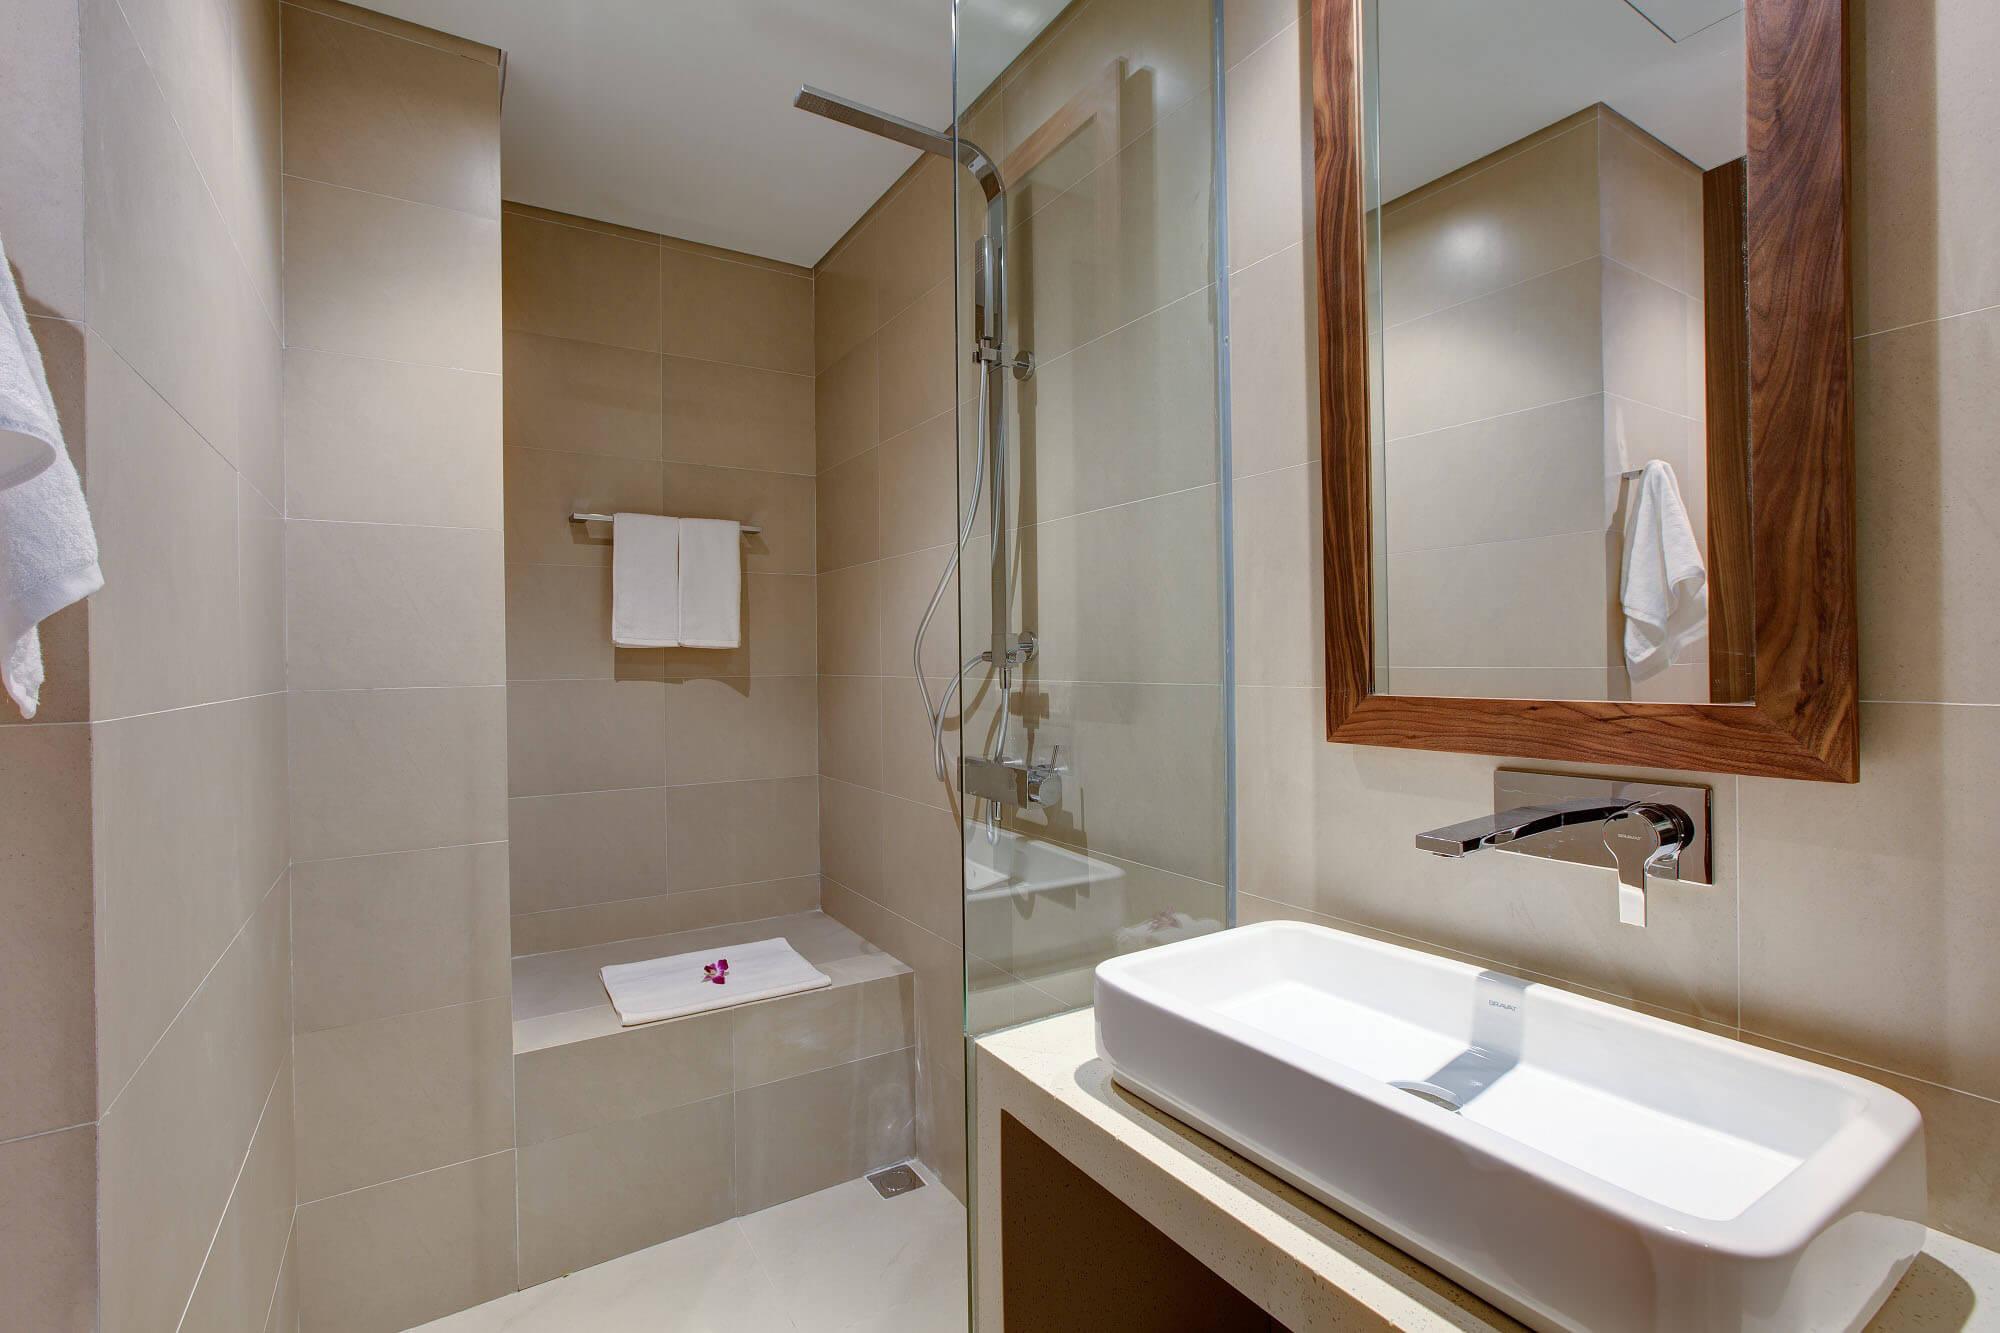 Highlight Plus Apartment Apartment A La Carte Danang Beach Hotel 200 Vo Nguyen Giap Danang Fantasticity Com 02